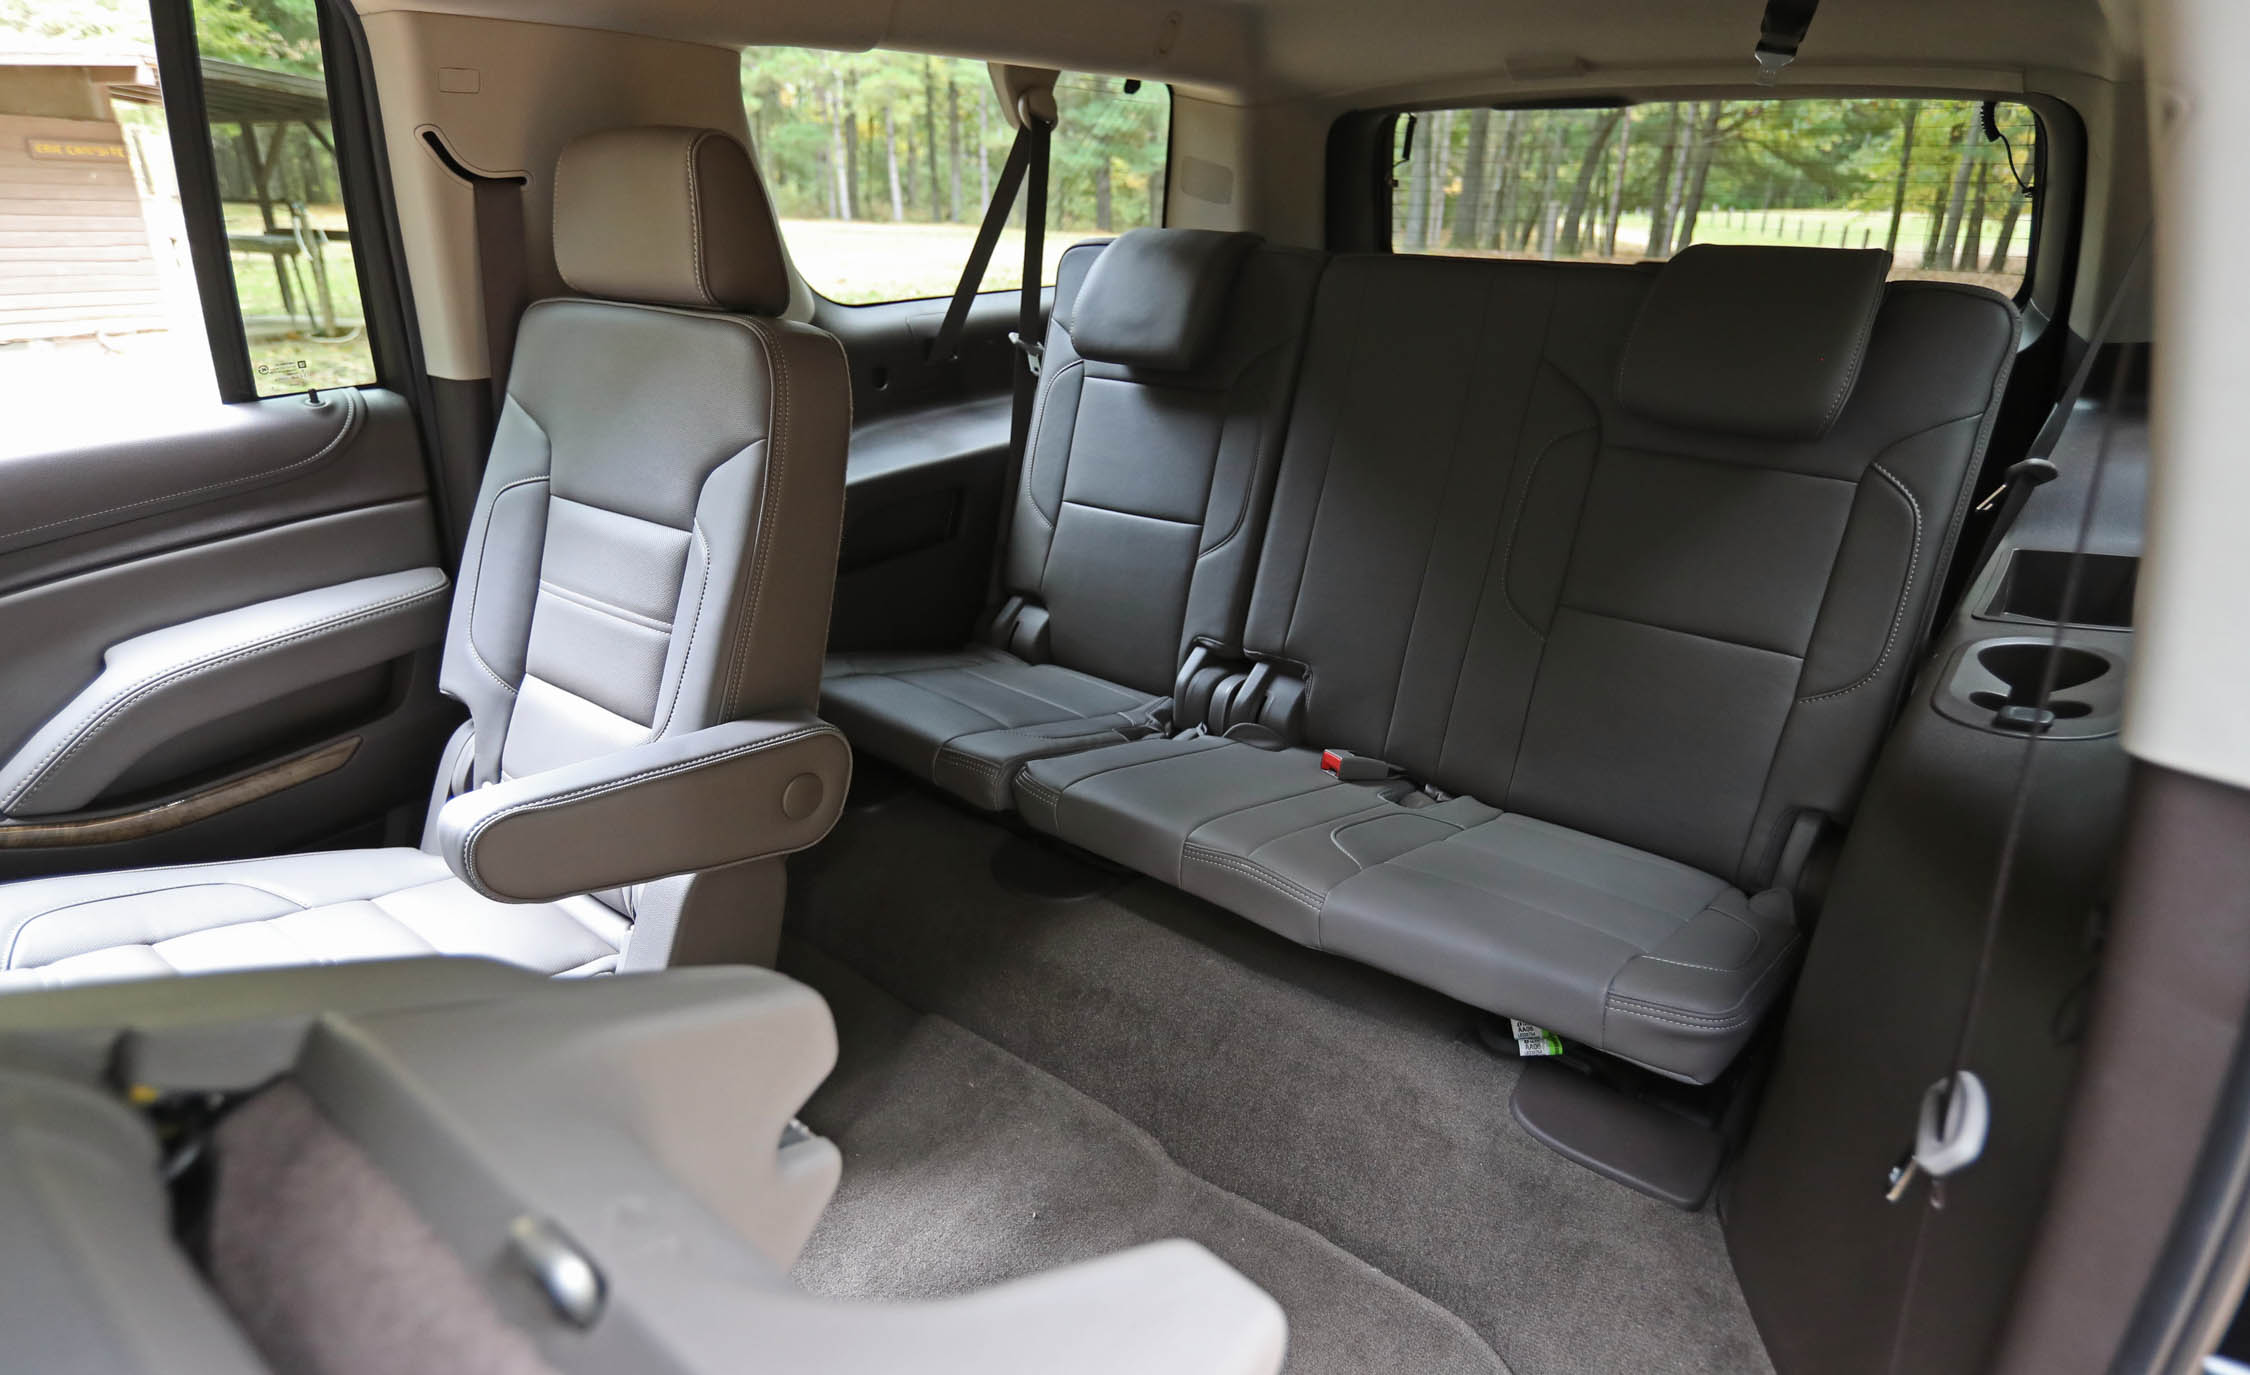 2017 Gmc Yukon Xl Denali Interior Seats Rear Back 3rd Row (View 11 of 26)